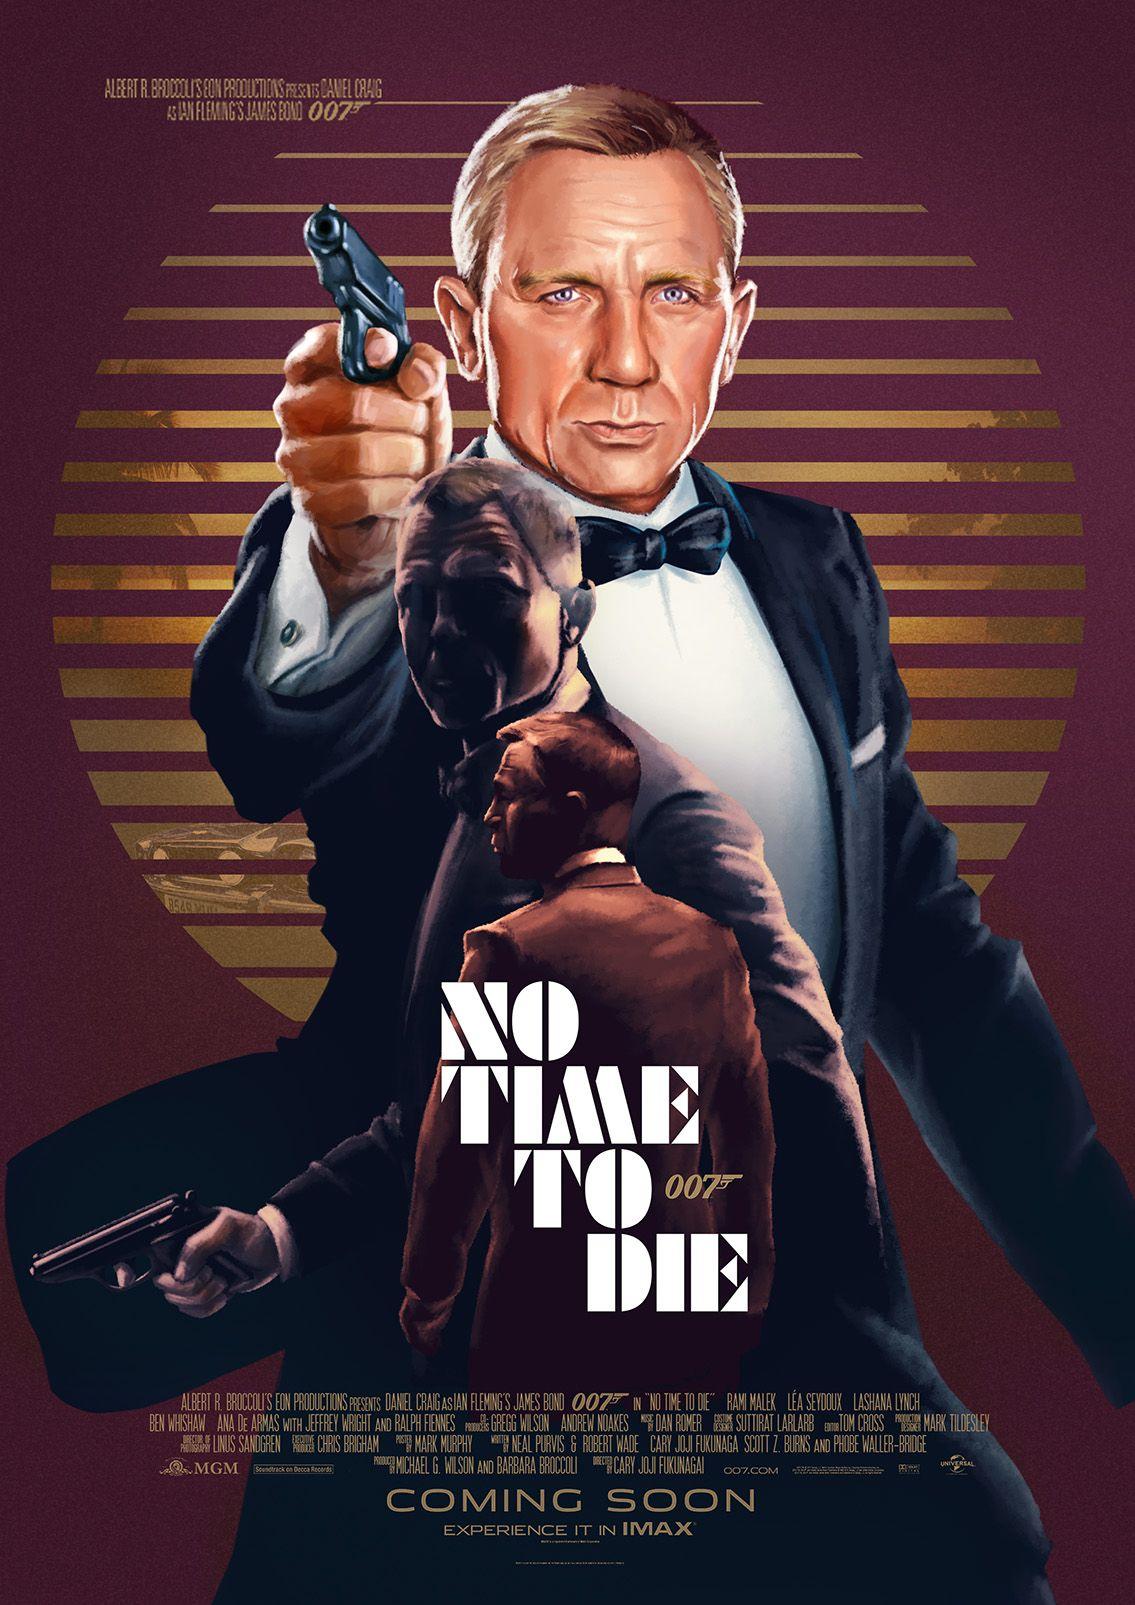 Pin By Orange Jus On James Bond 2020s James Bond Movie Posters Bond Movies James Bond Movies